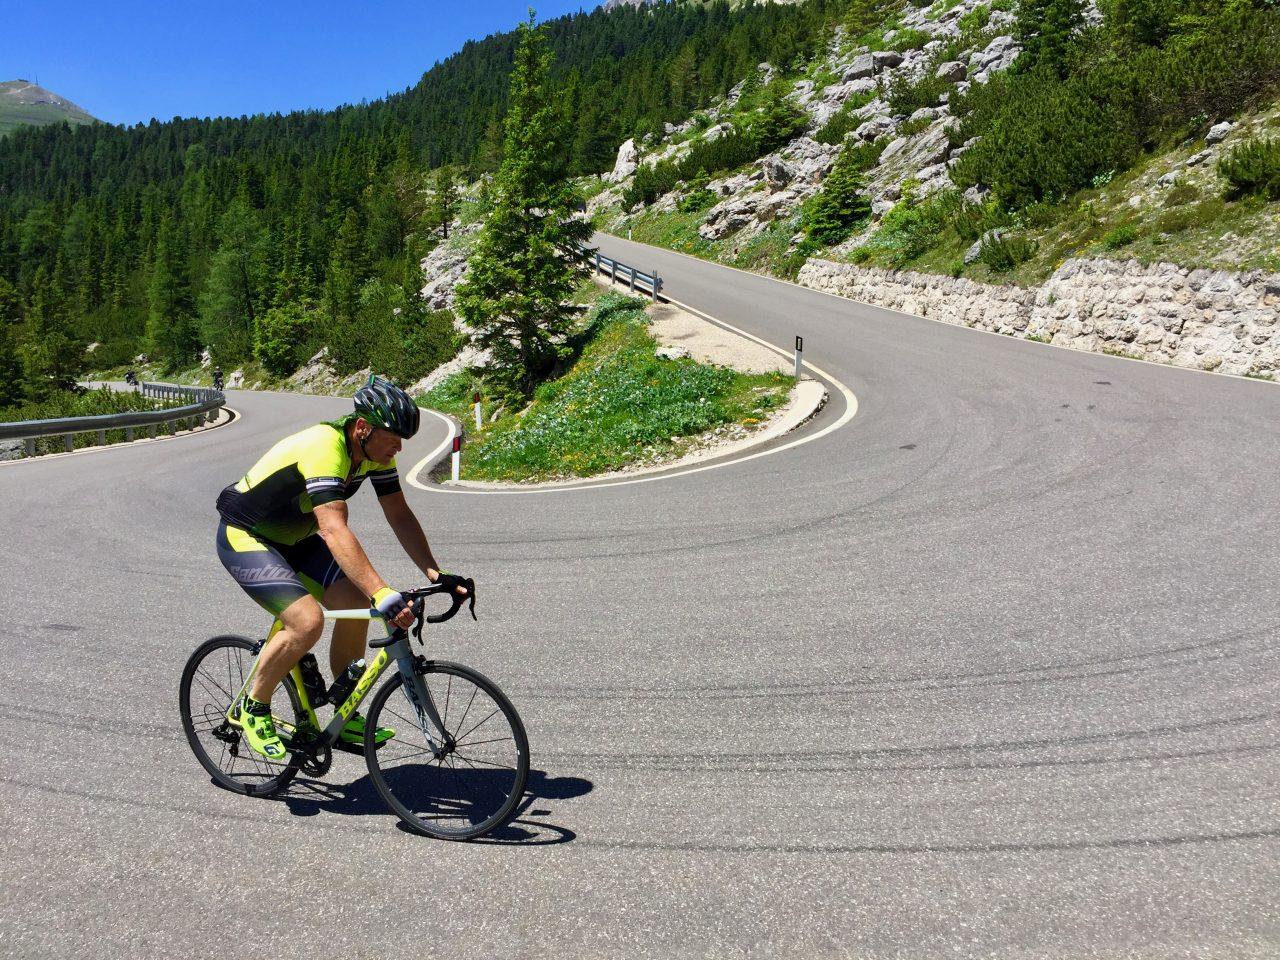 Andi, Auffahrt Passo Sella, Dolomites, Italy